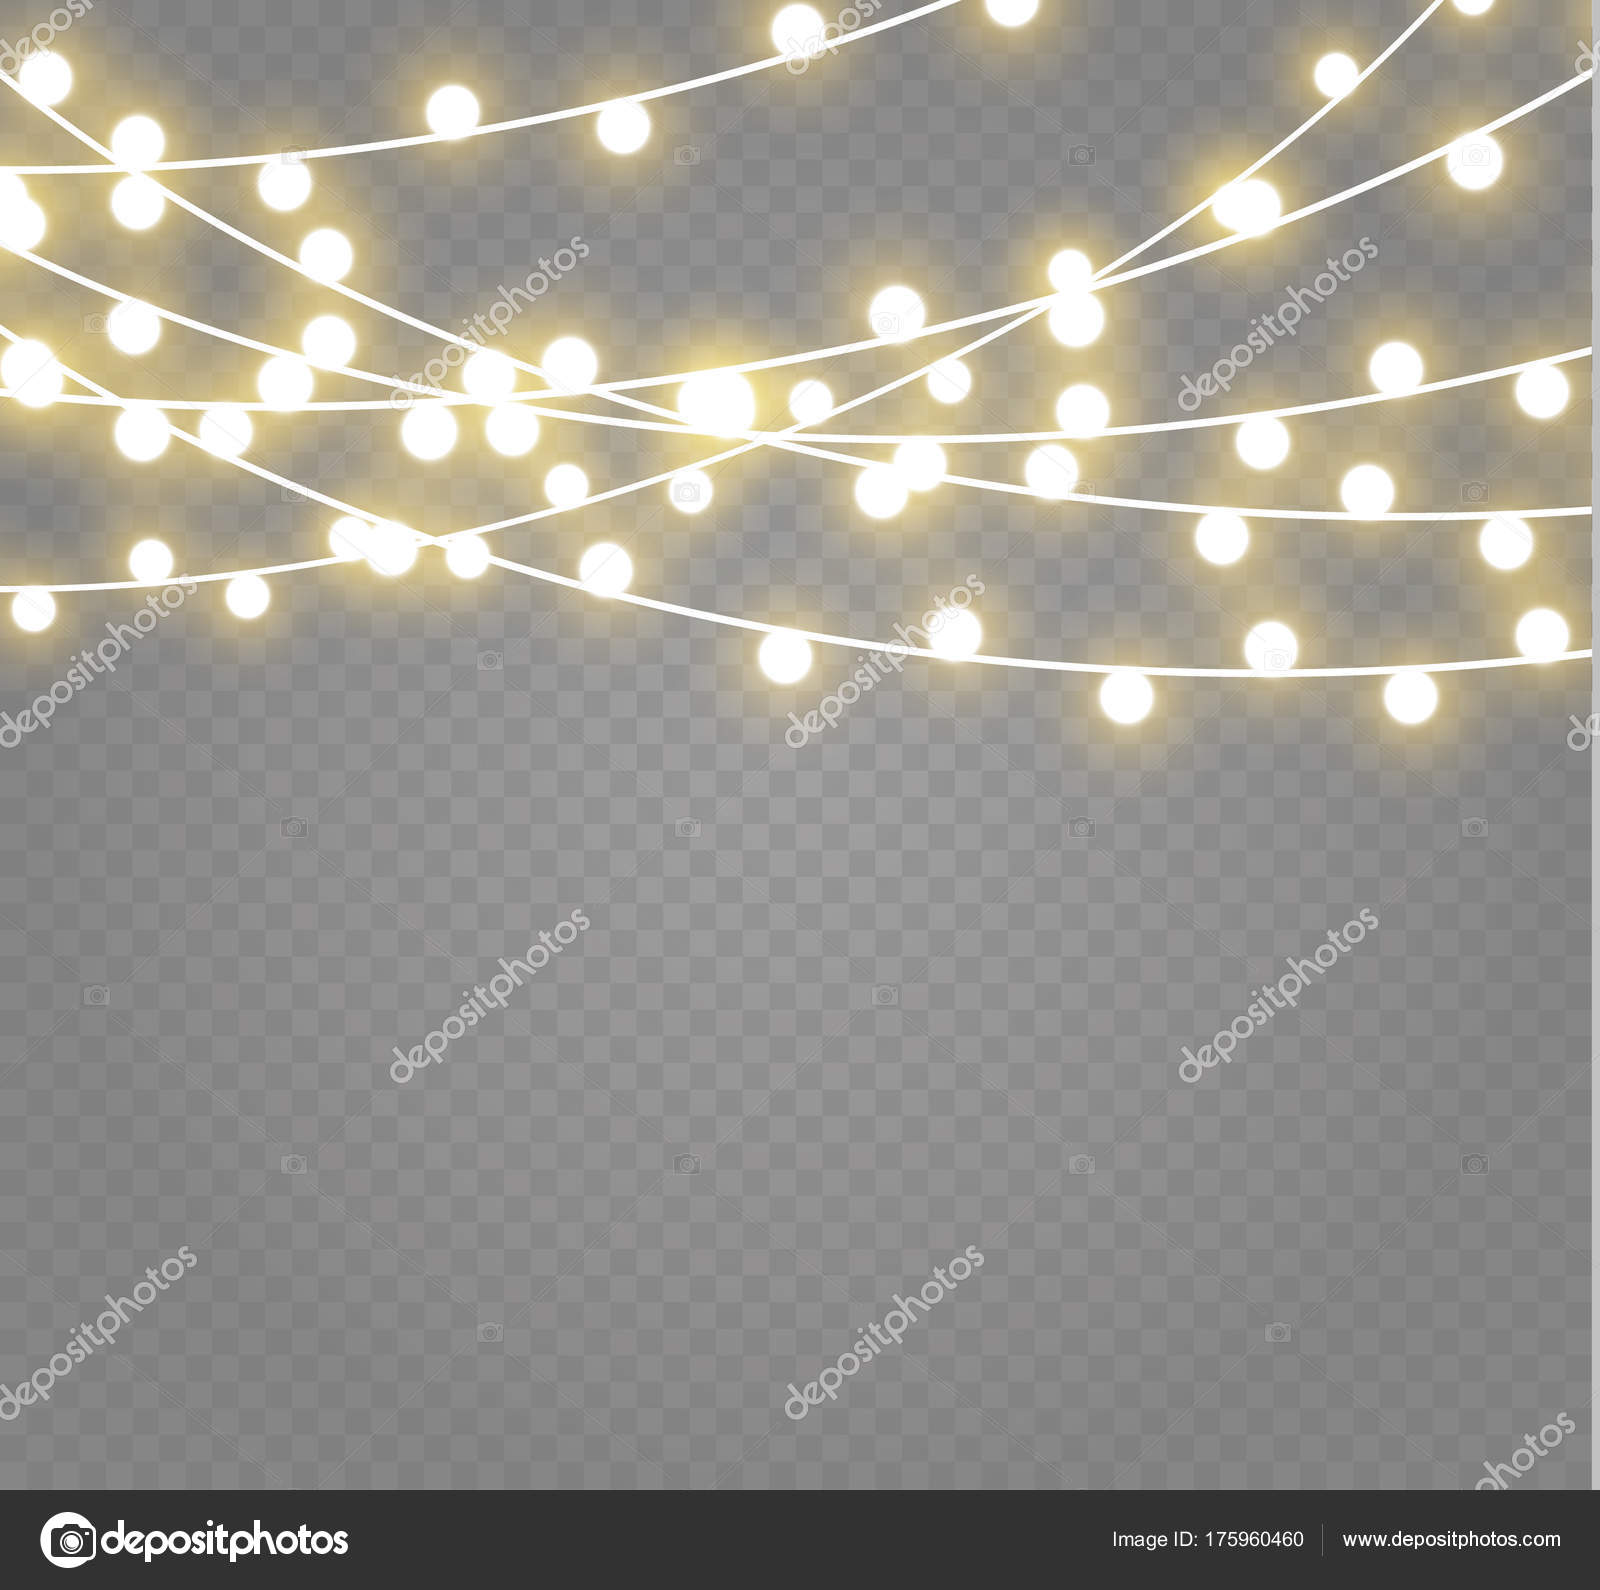 Christmas Lights Transparent Background.Christmas Lights Isolated On Transparent Background Xmas